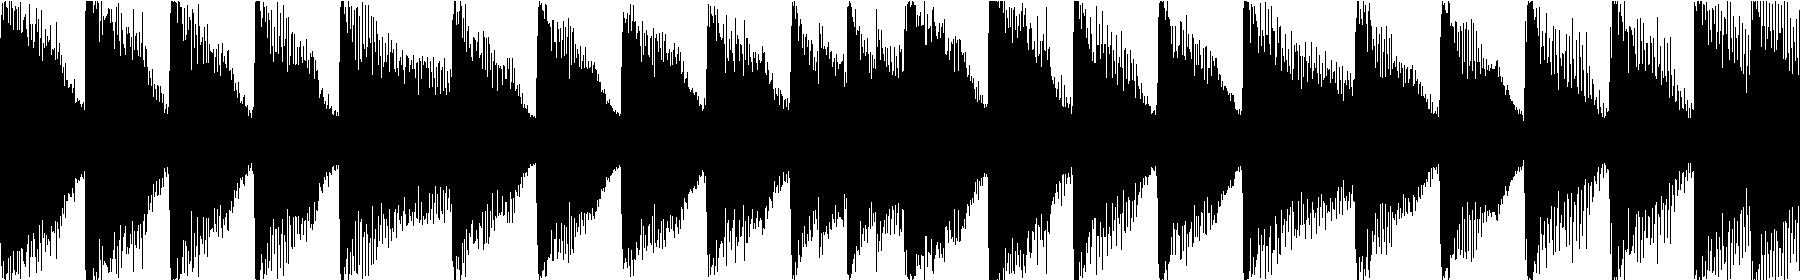 vedh melodyloop 058 gm7 dm7 emaj7 f g gm7 124bpm